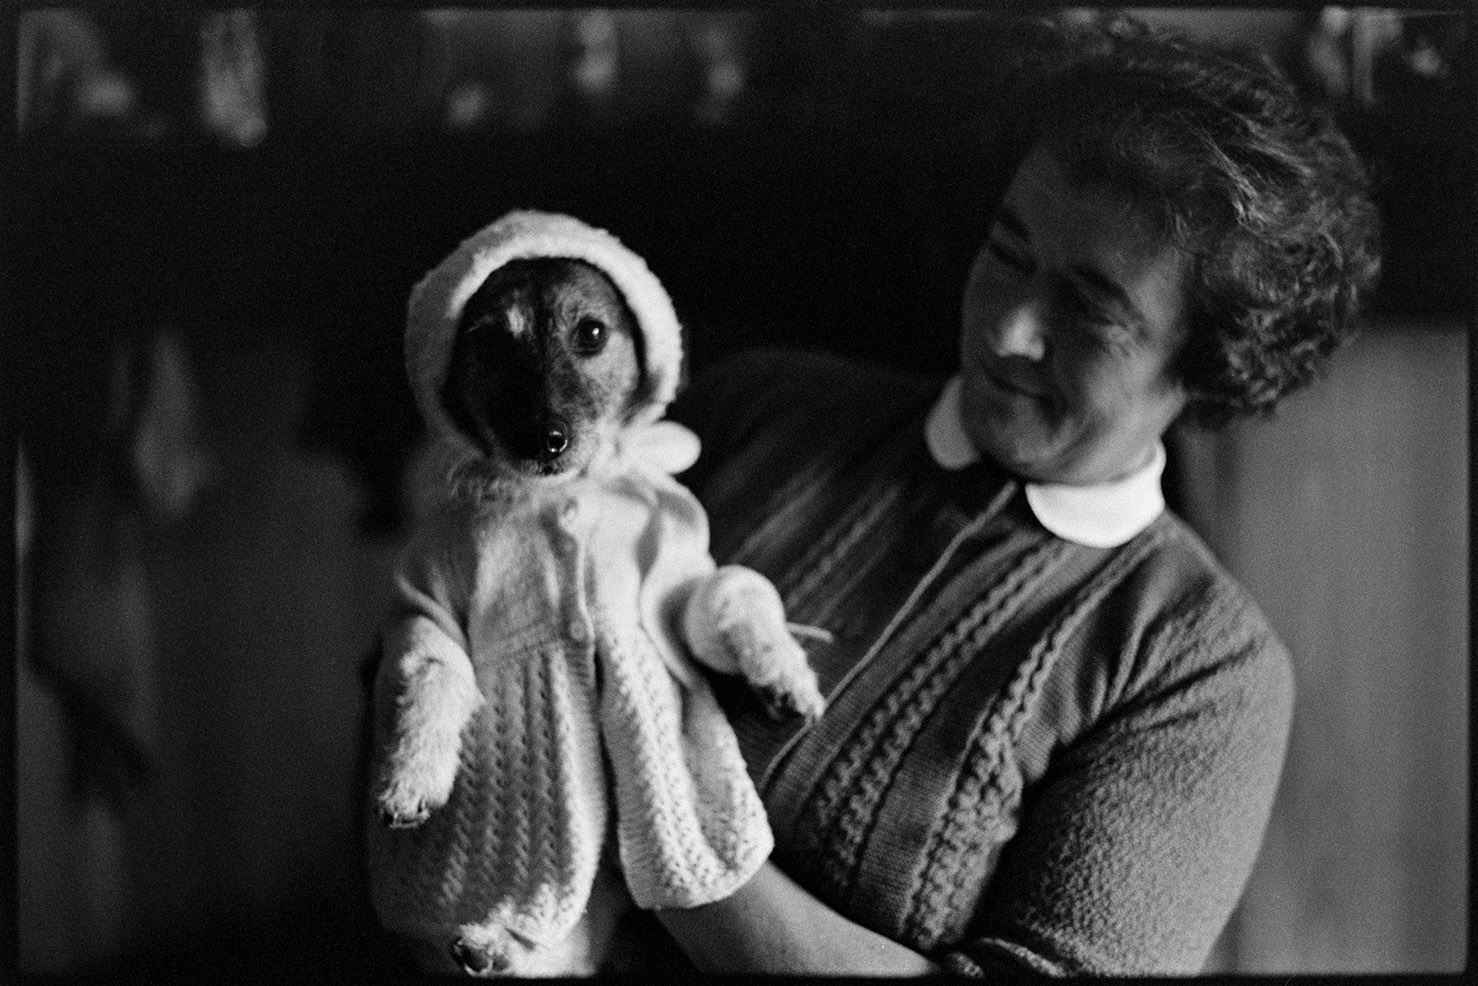 Dog in fancy dress, Oak family, Hatherleigh, Deckport, May 1976